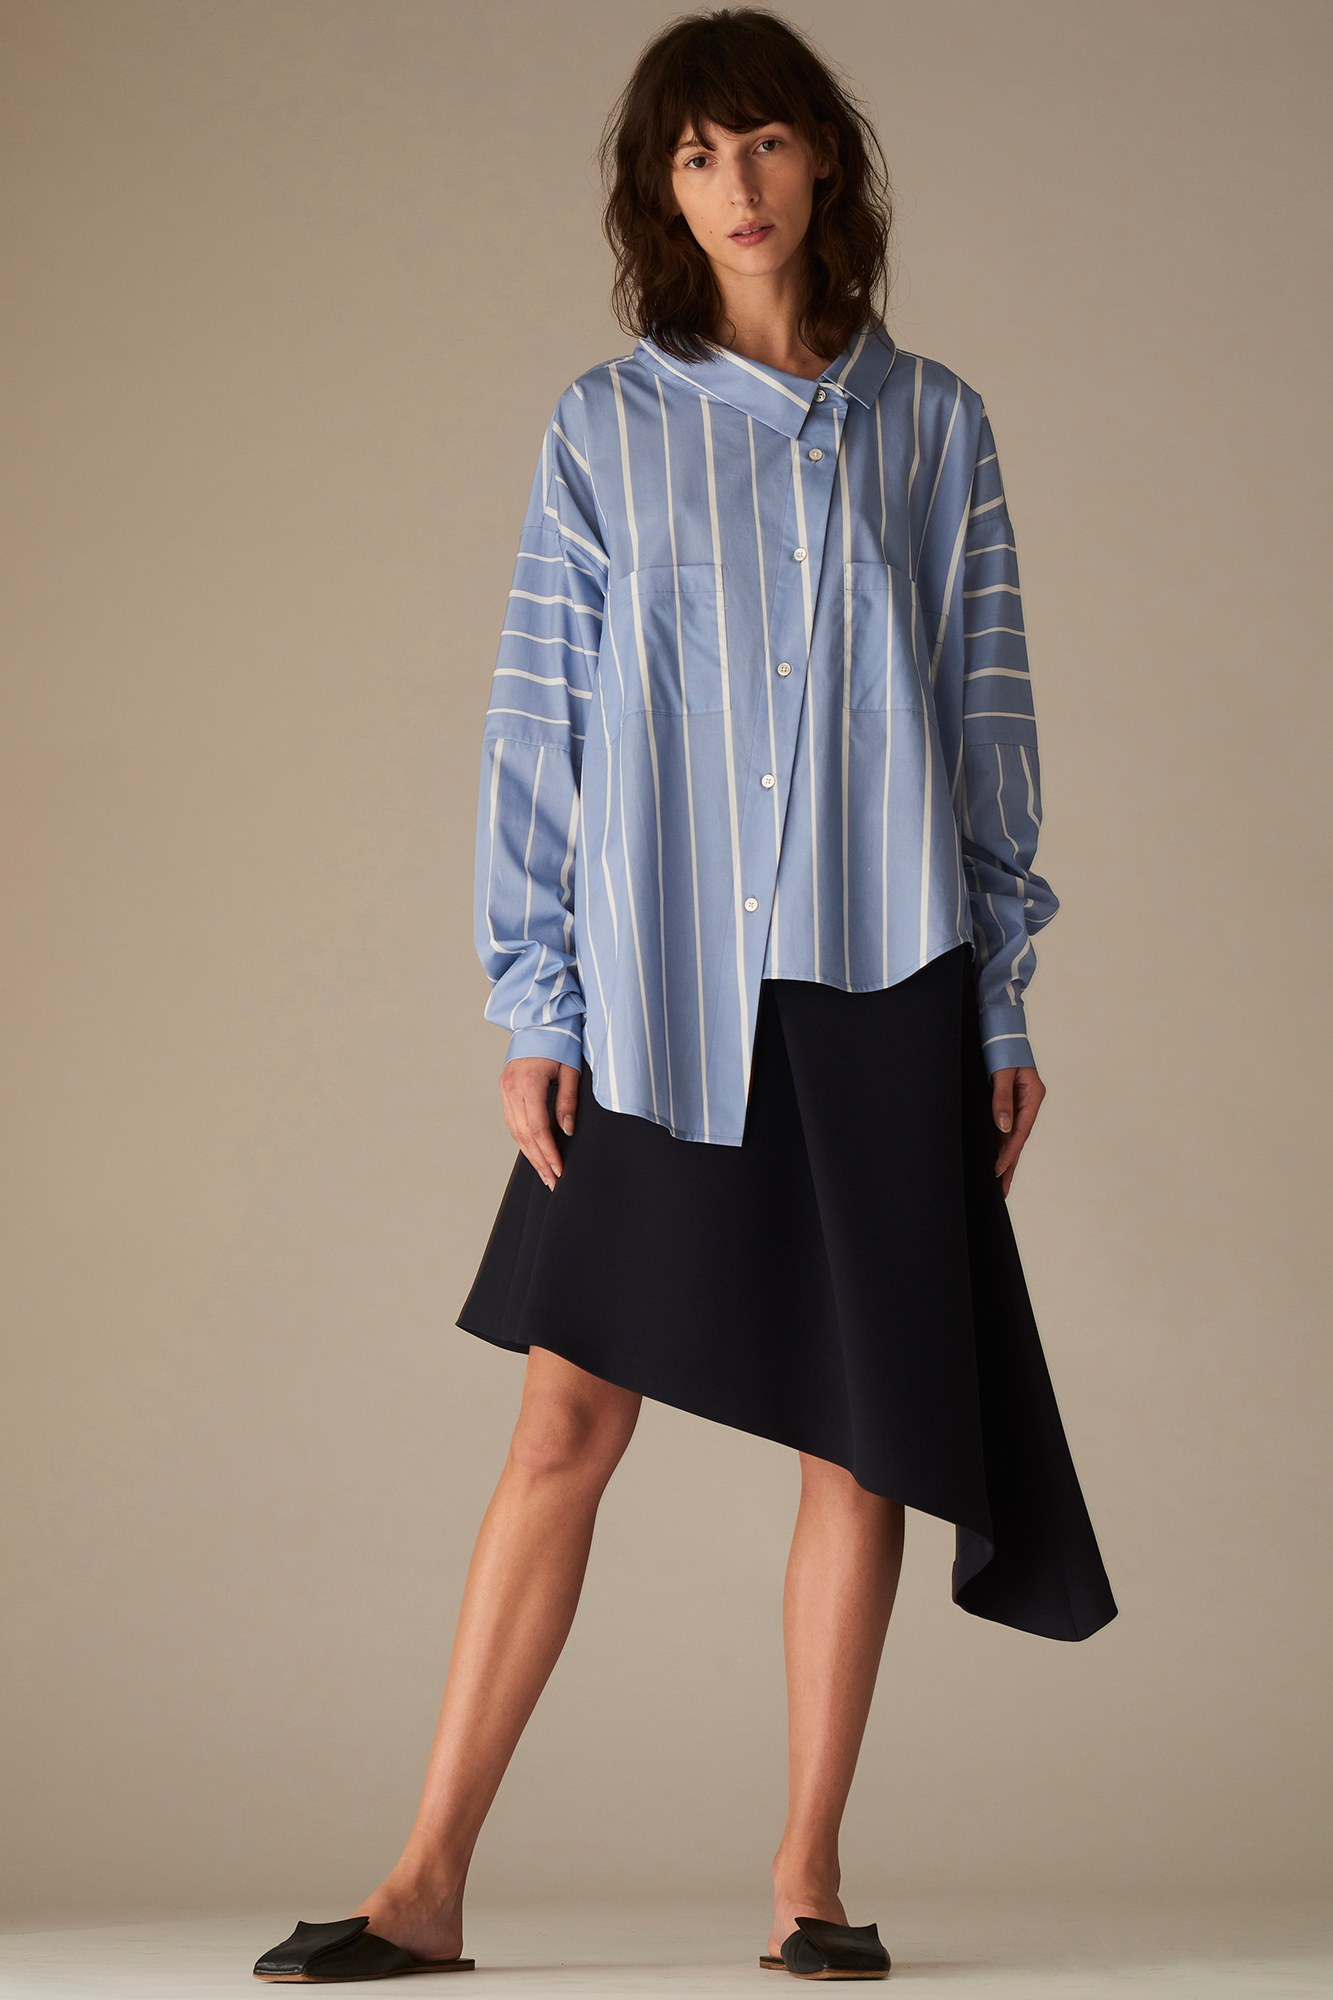 Асимметричная трикотажная блузка